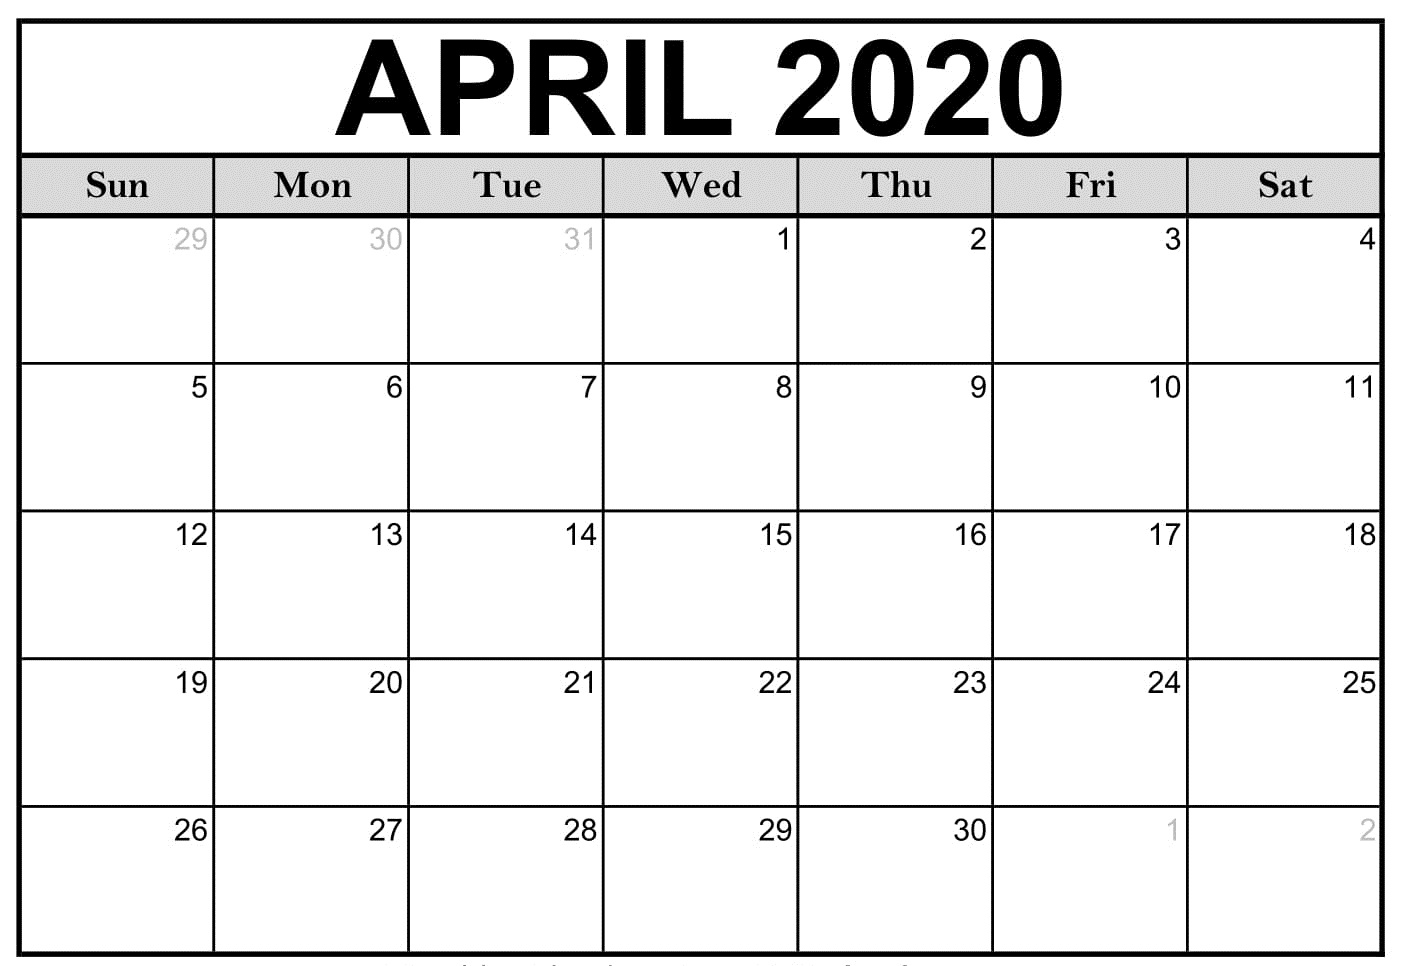 April Calendar 2020 (2)